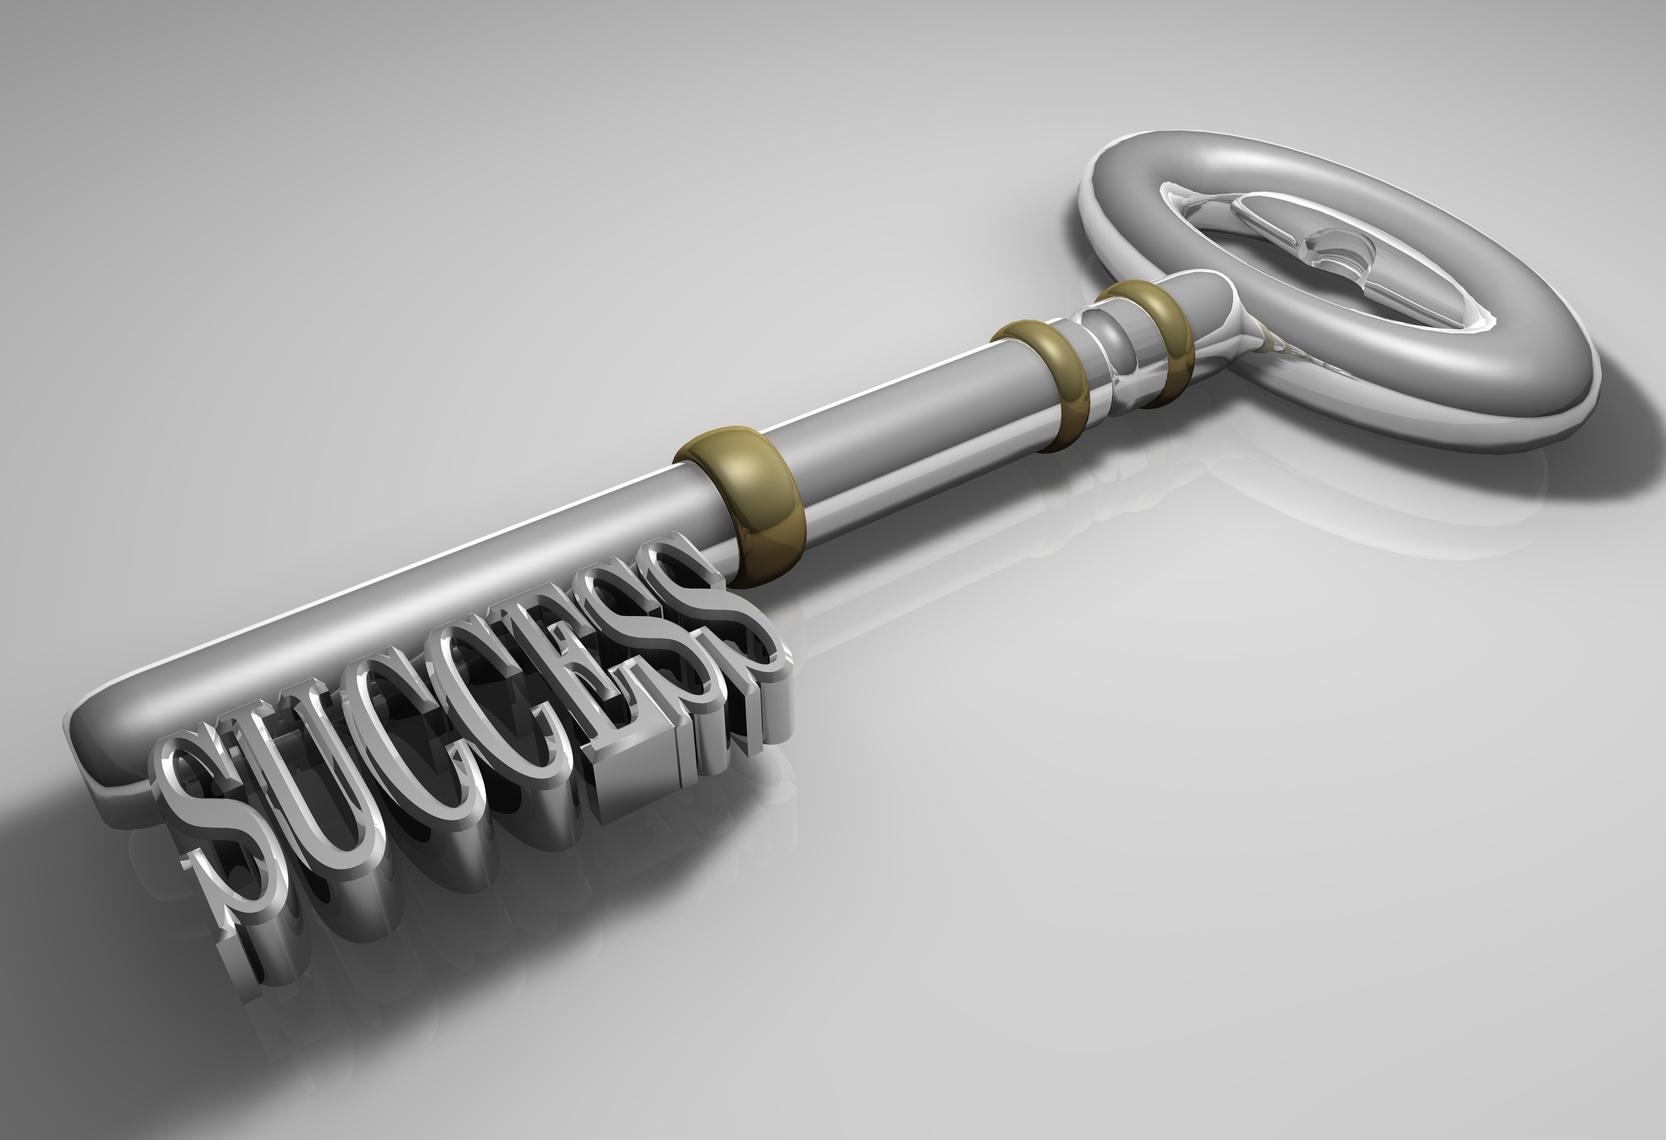 Key_to_success